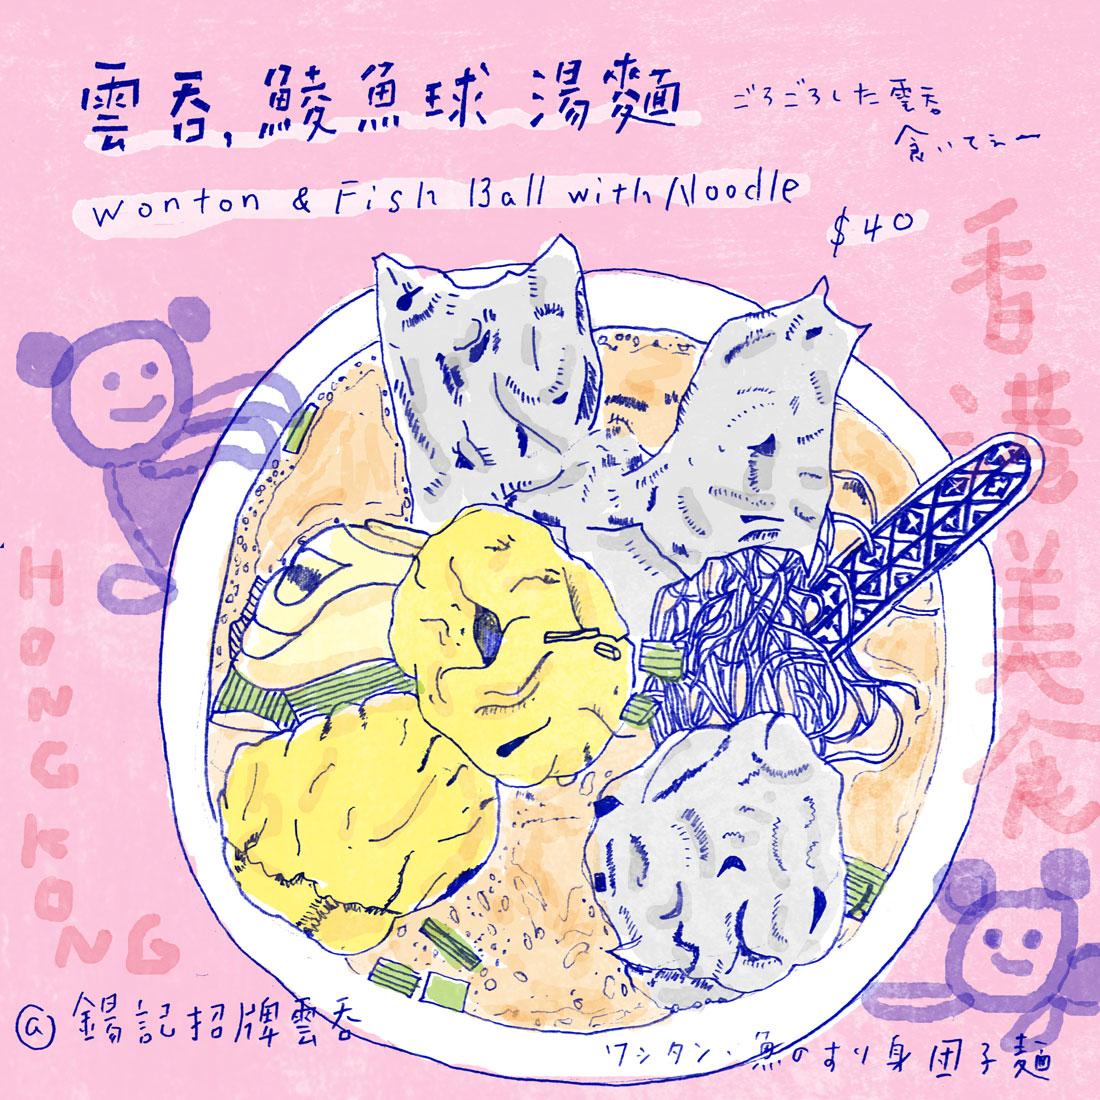 Takako Masuki's drawing of wonton and fish soup.